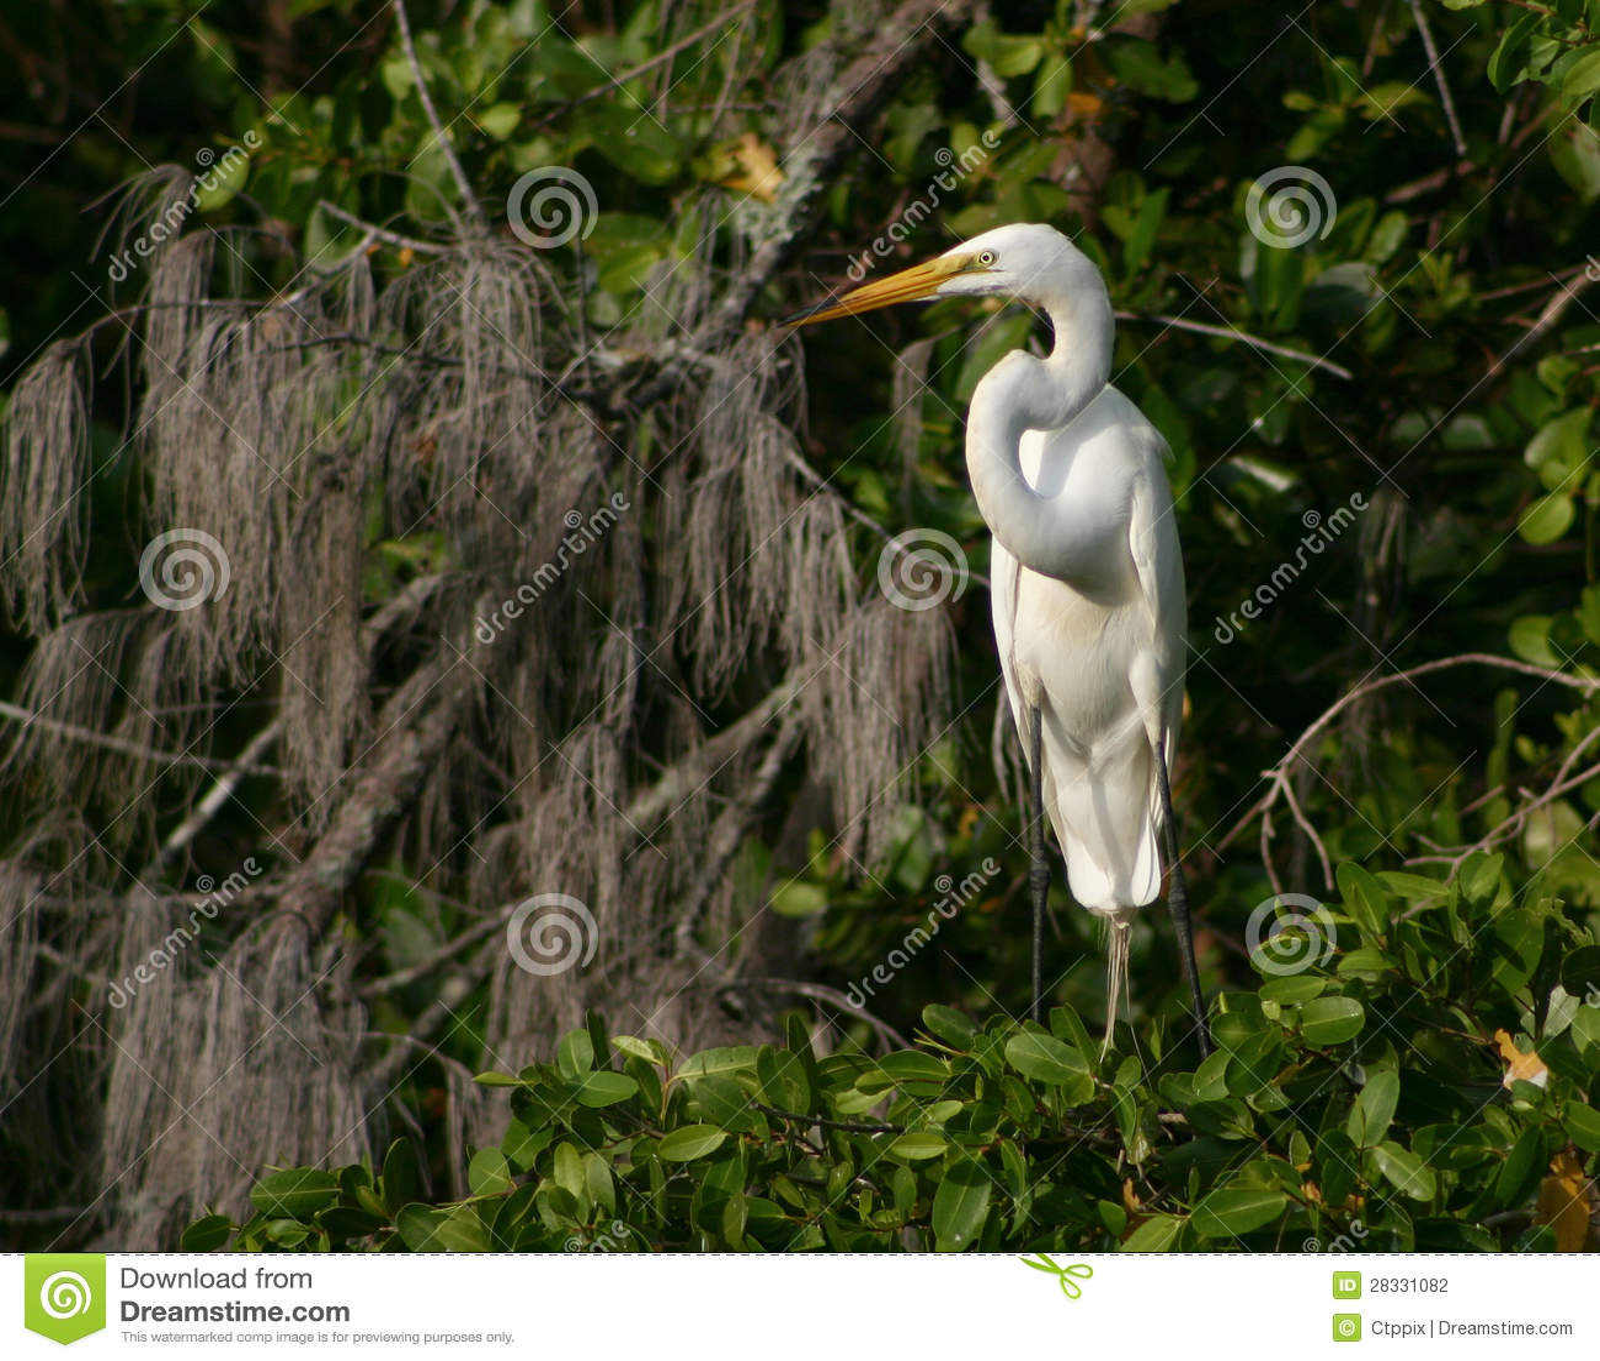 Video's van Great white egret breeding season hacked